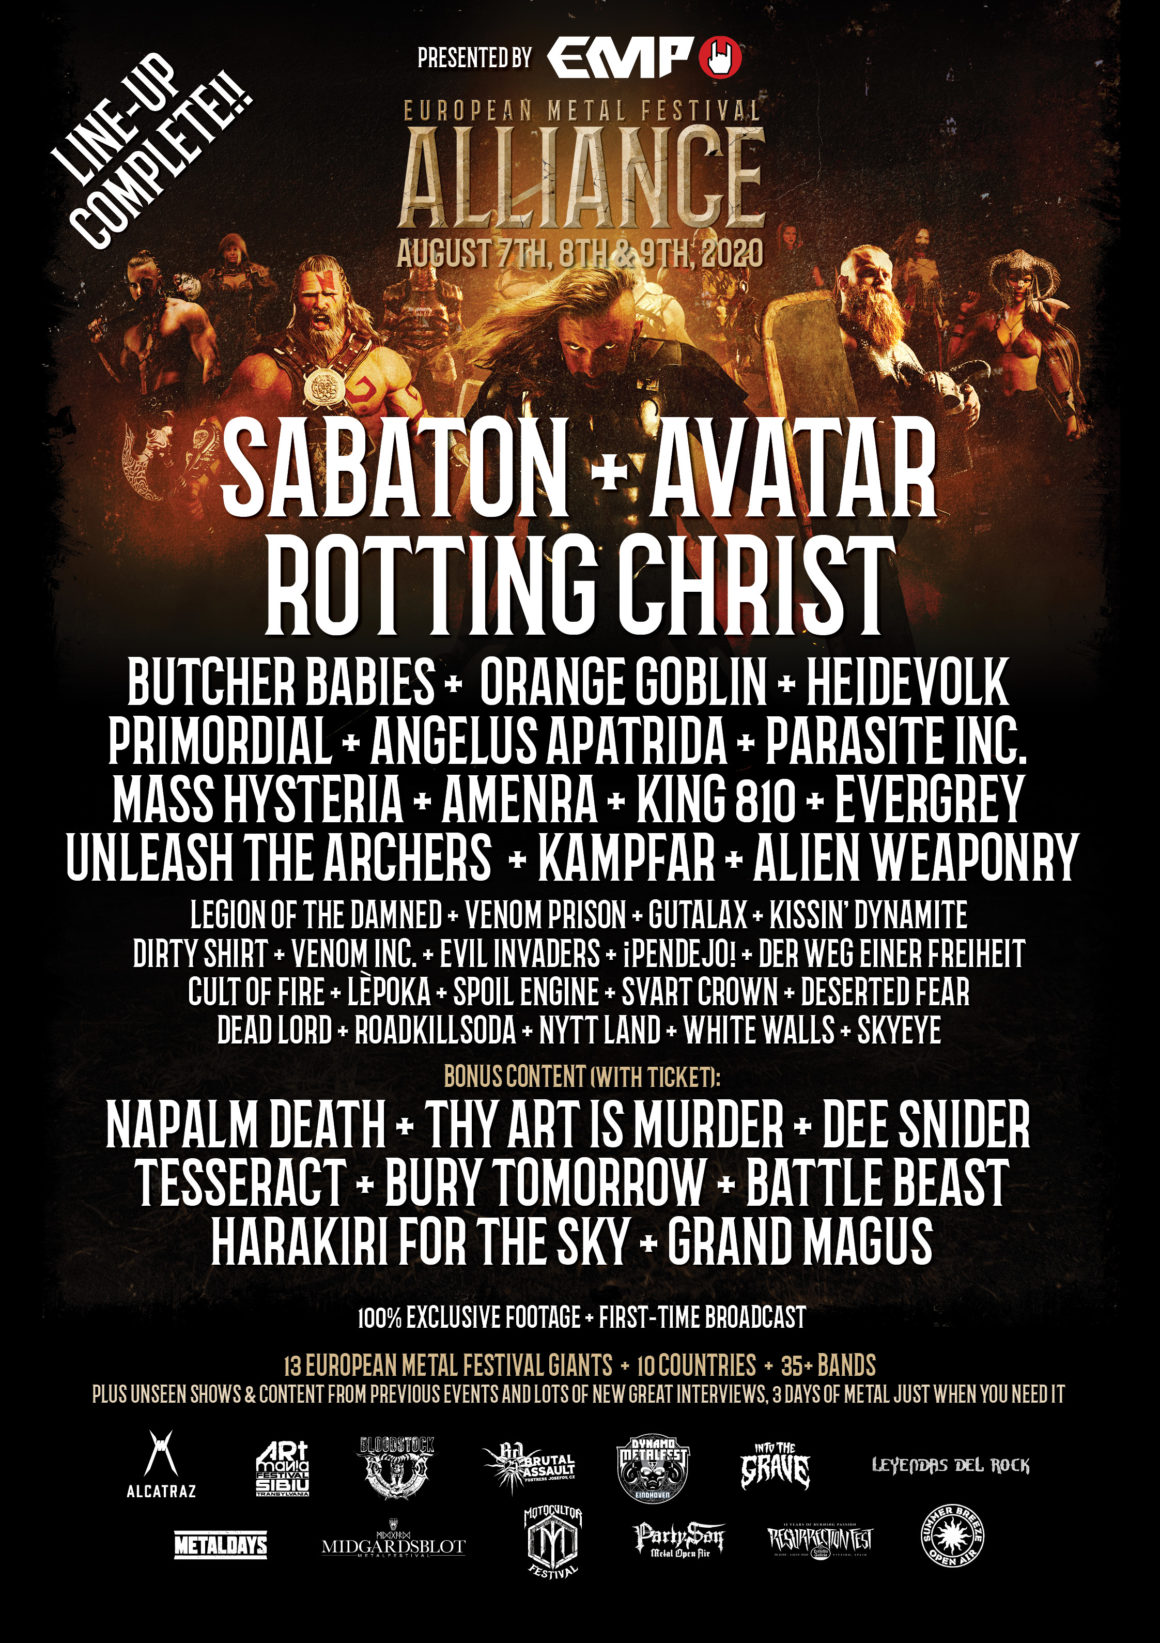 Cartel final de la European Metal Festival Alliance